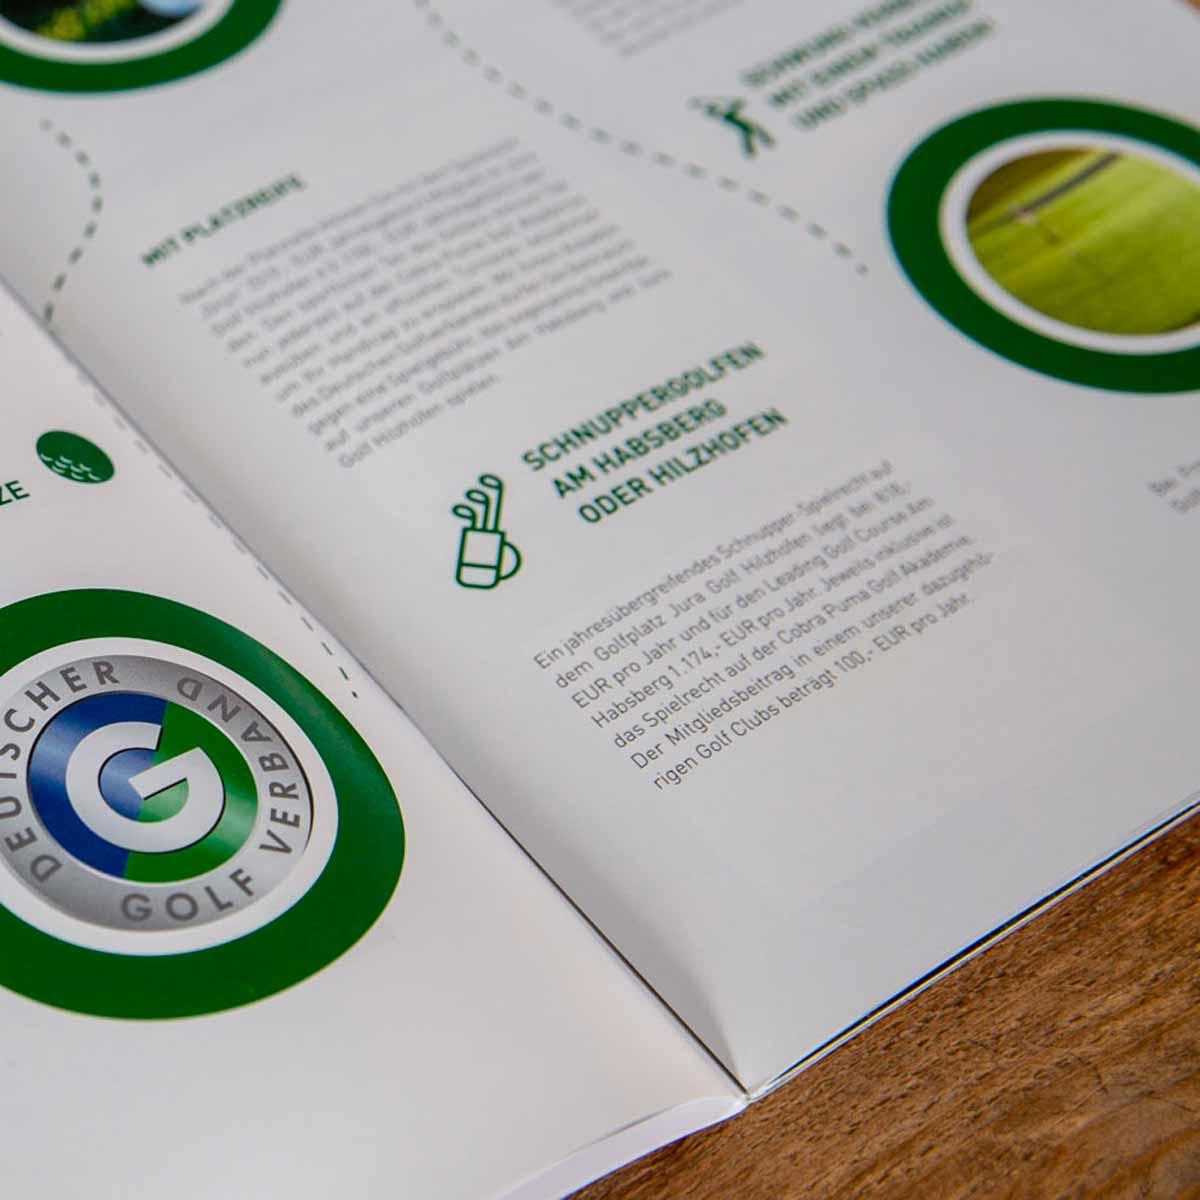 mr. pixel KG | Jura Golf Park Magazin | Weg2